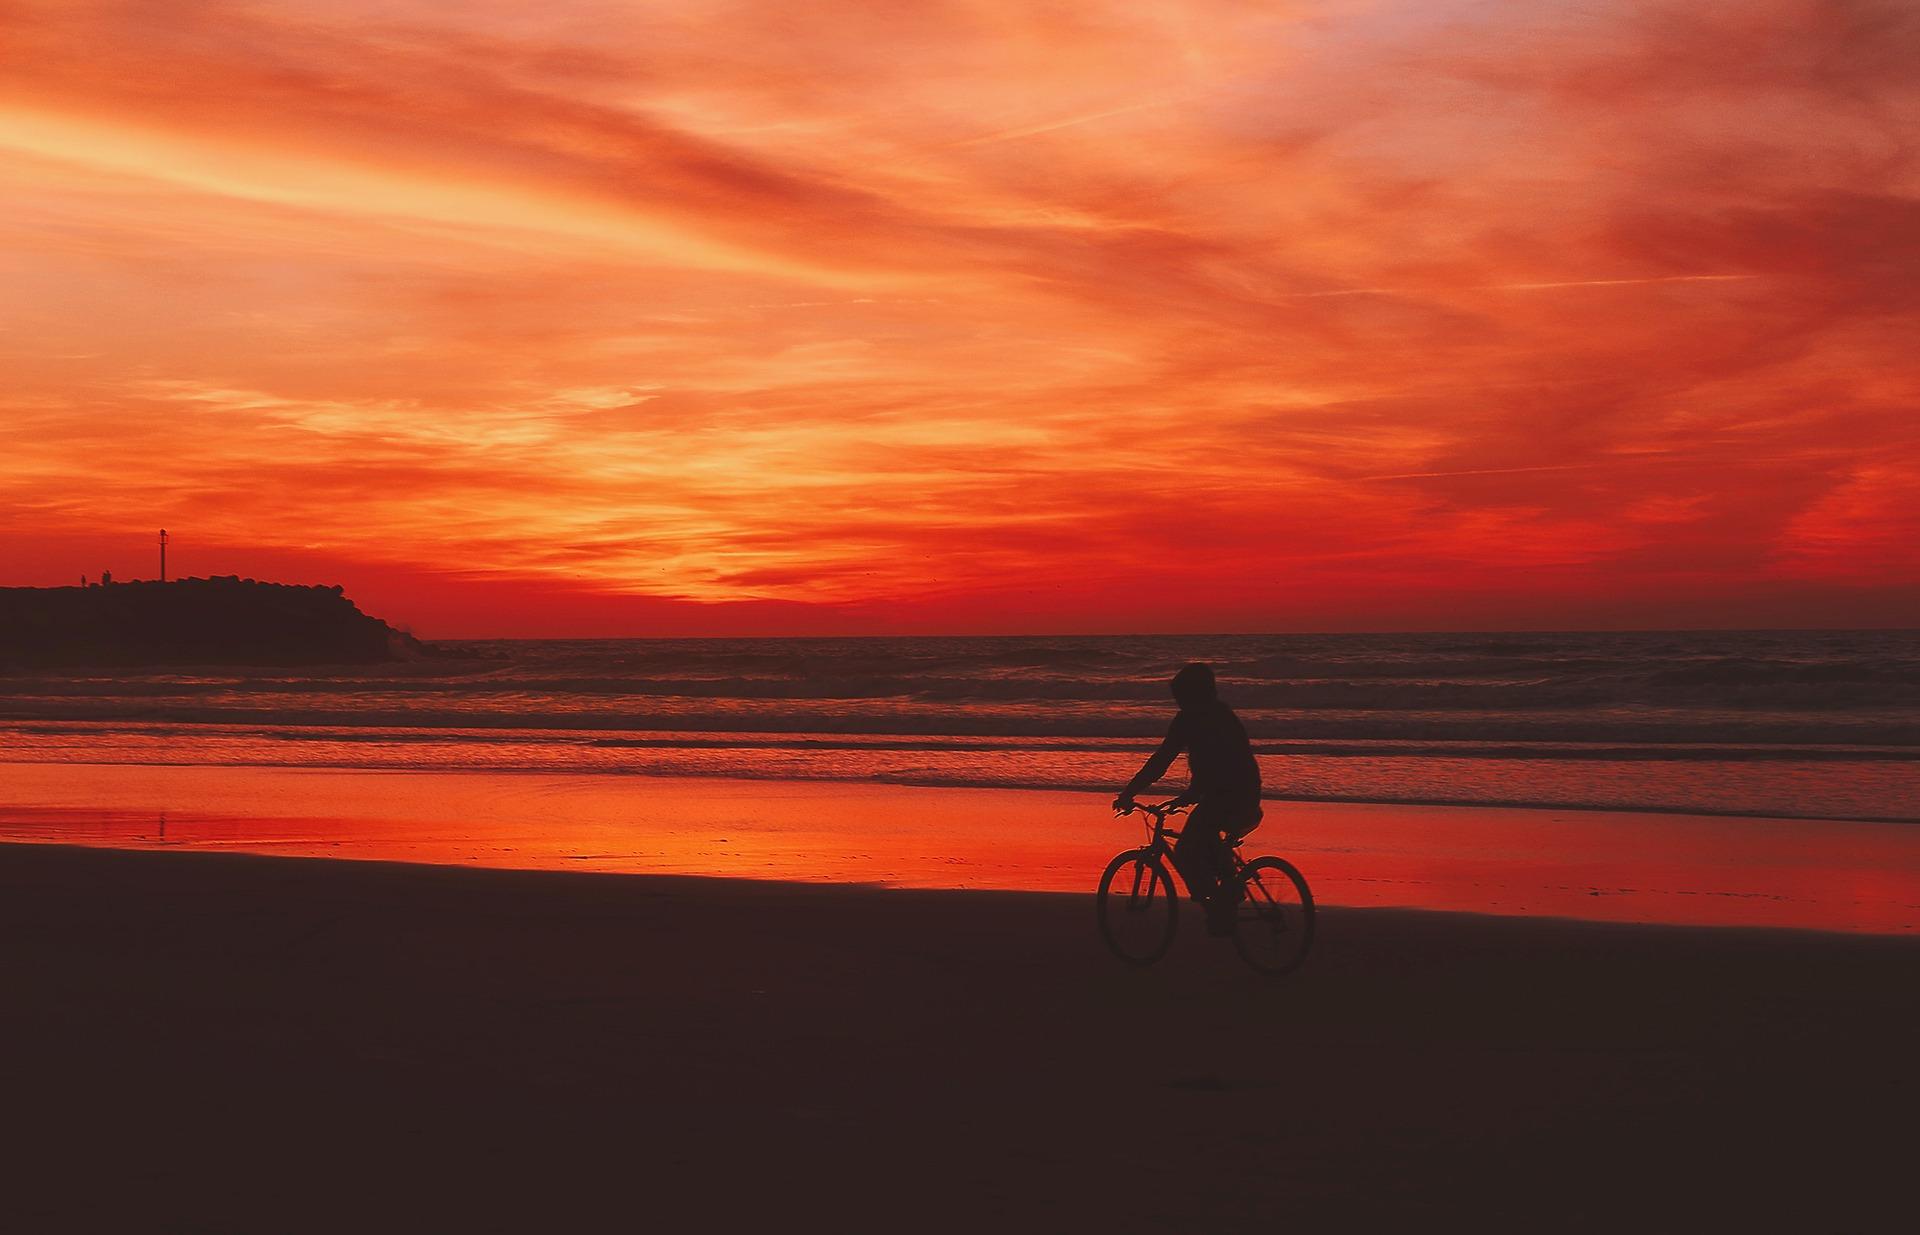 sunset-2126985_1920.jpg